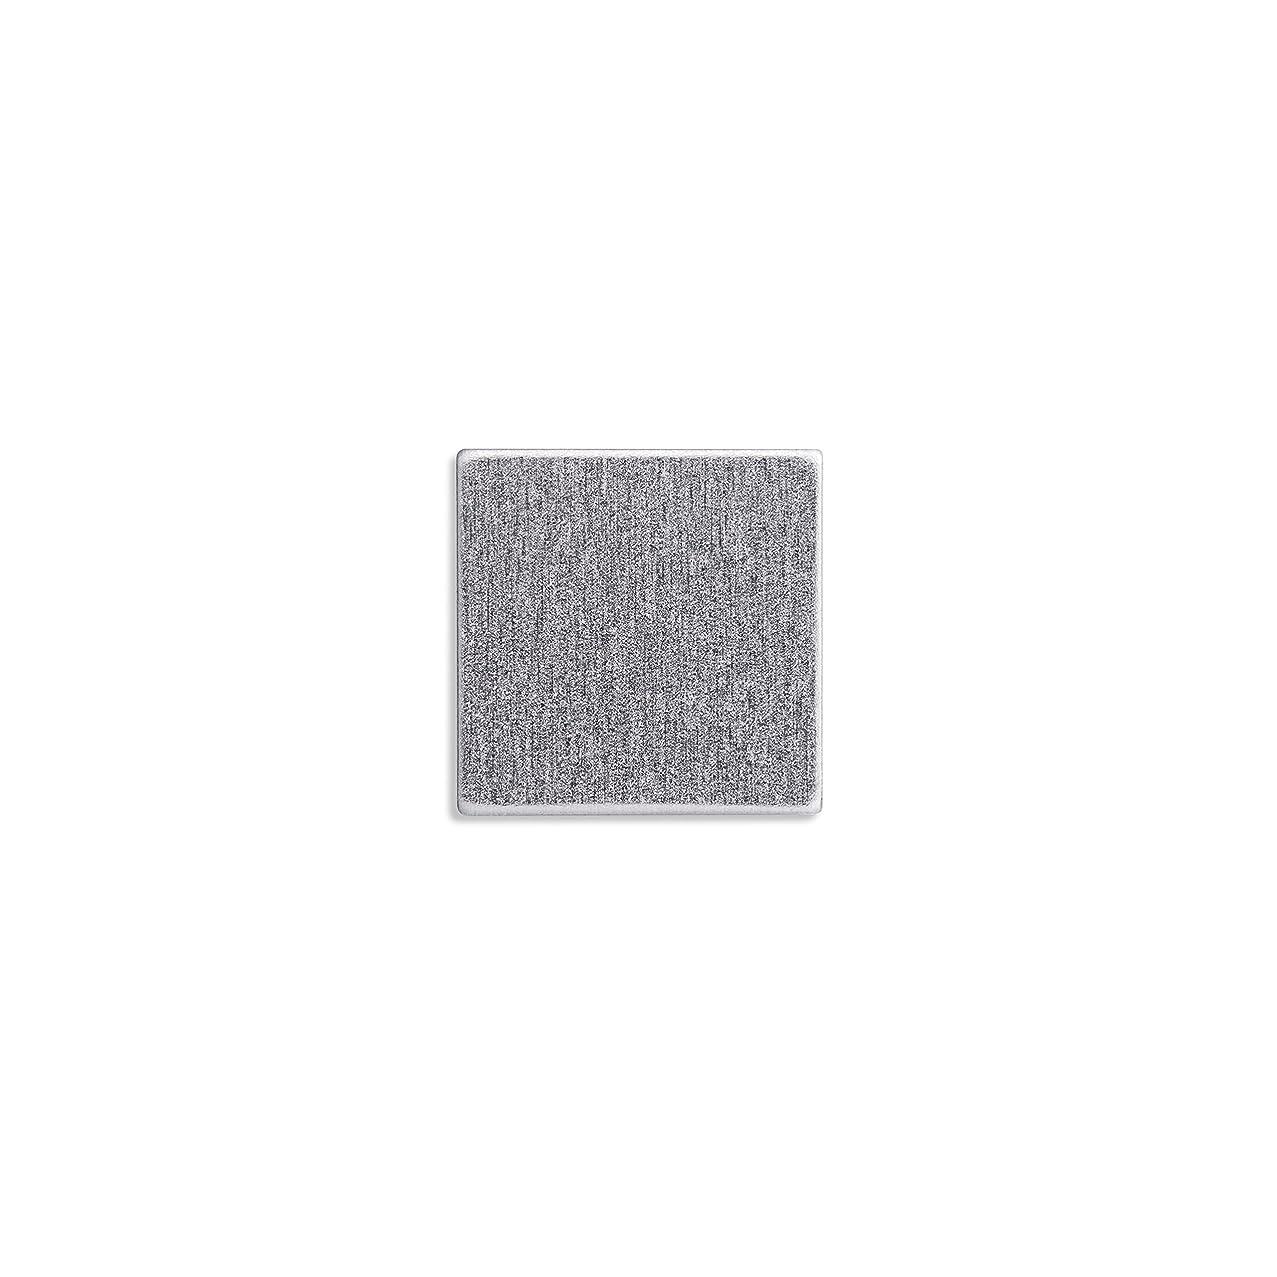 RMP Stamping Blanks, 2